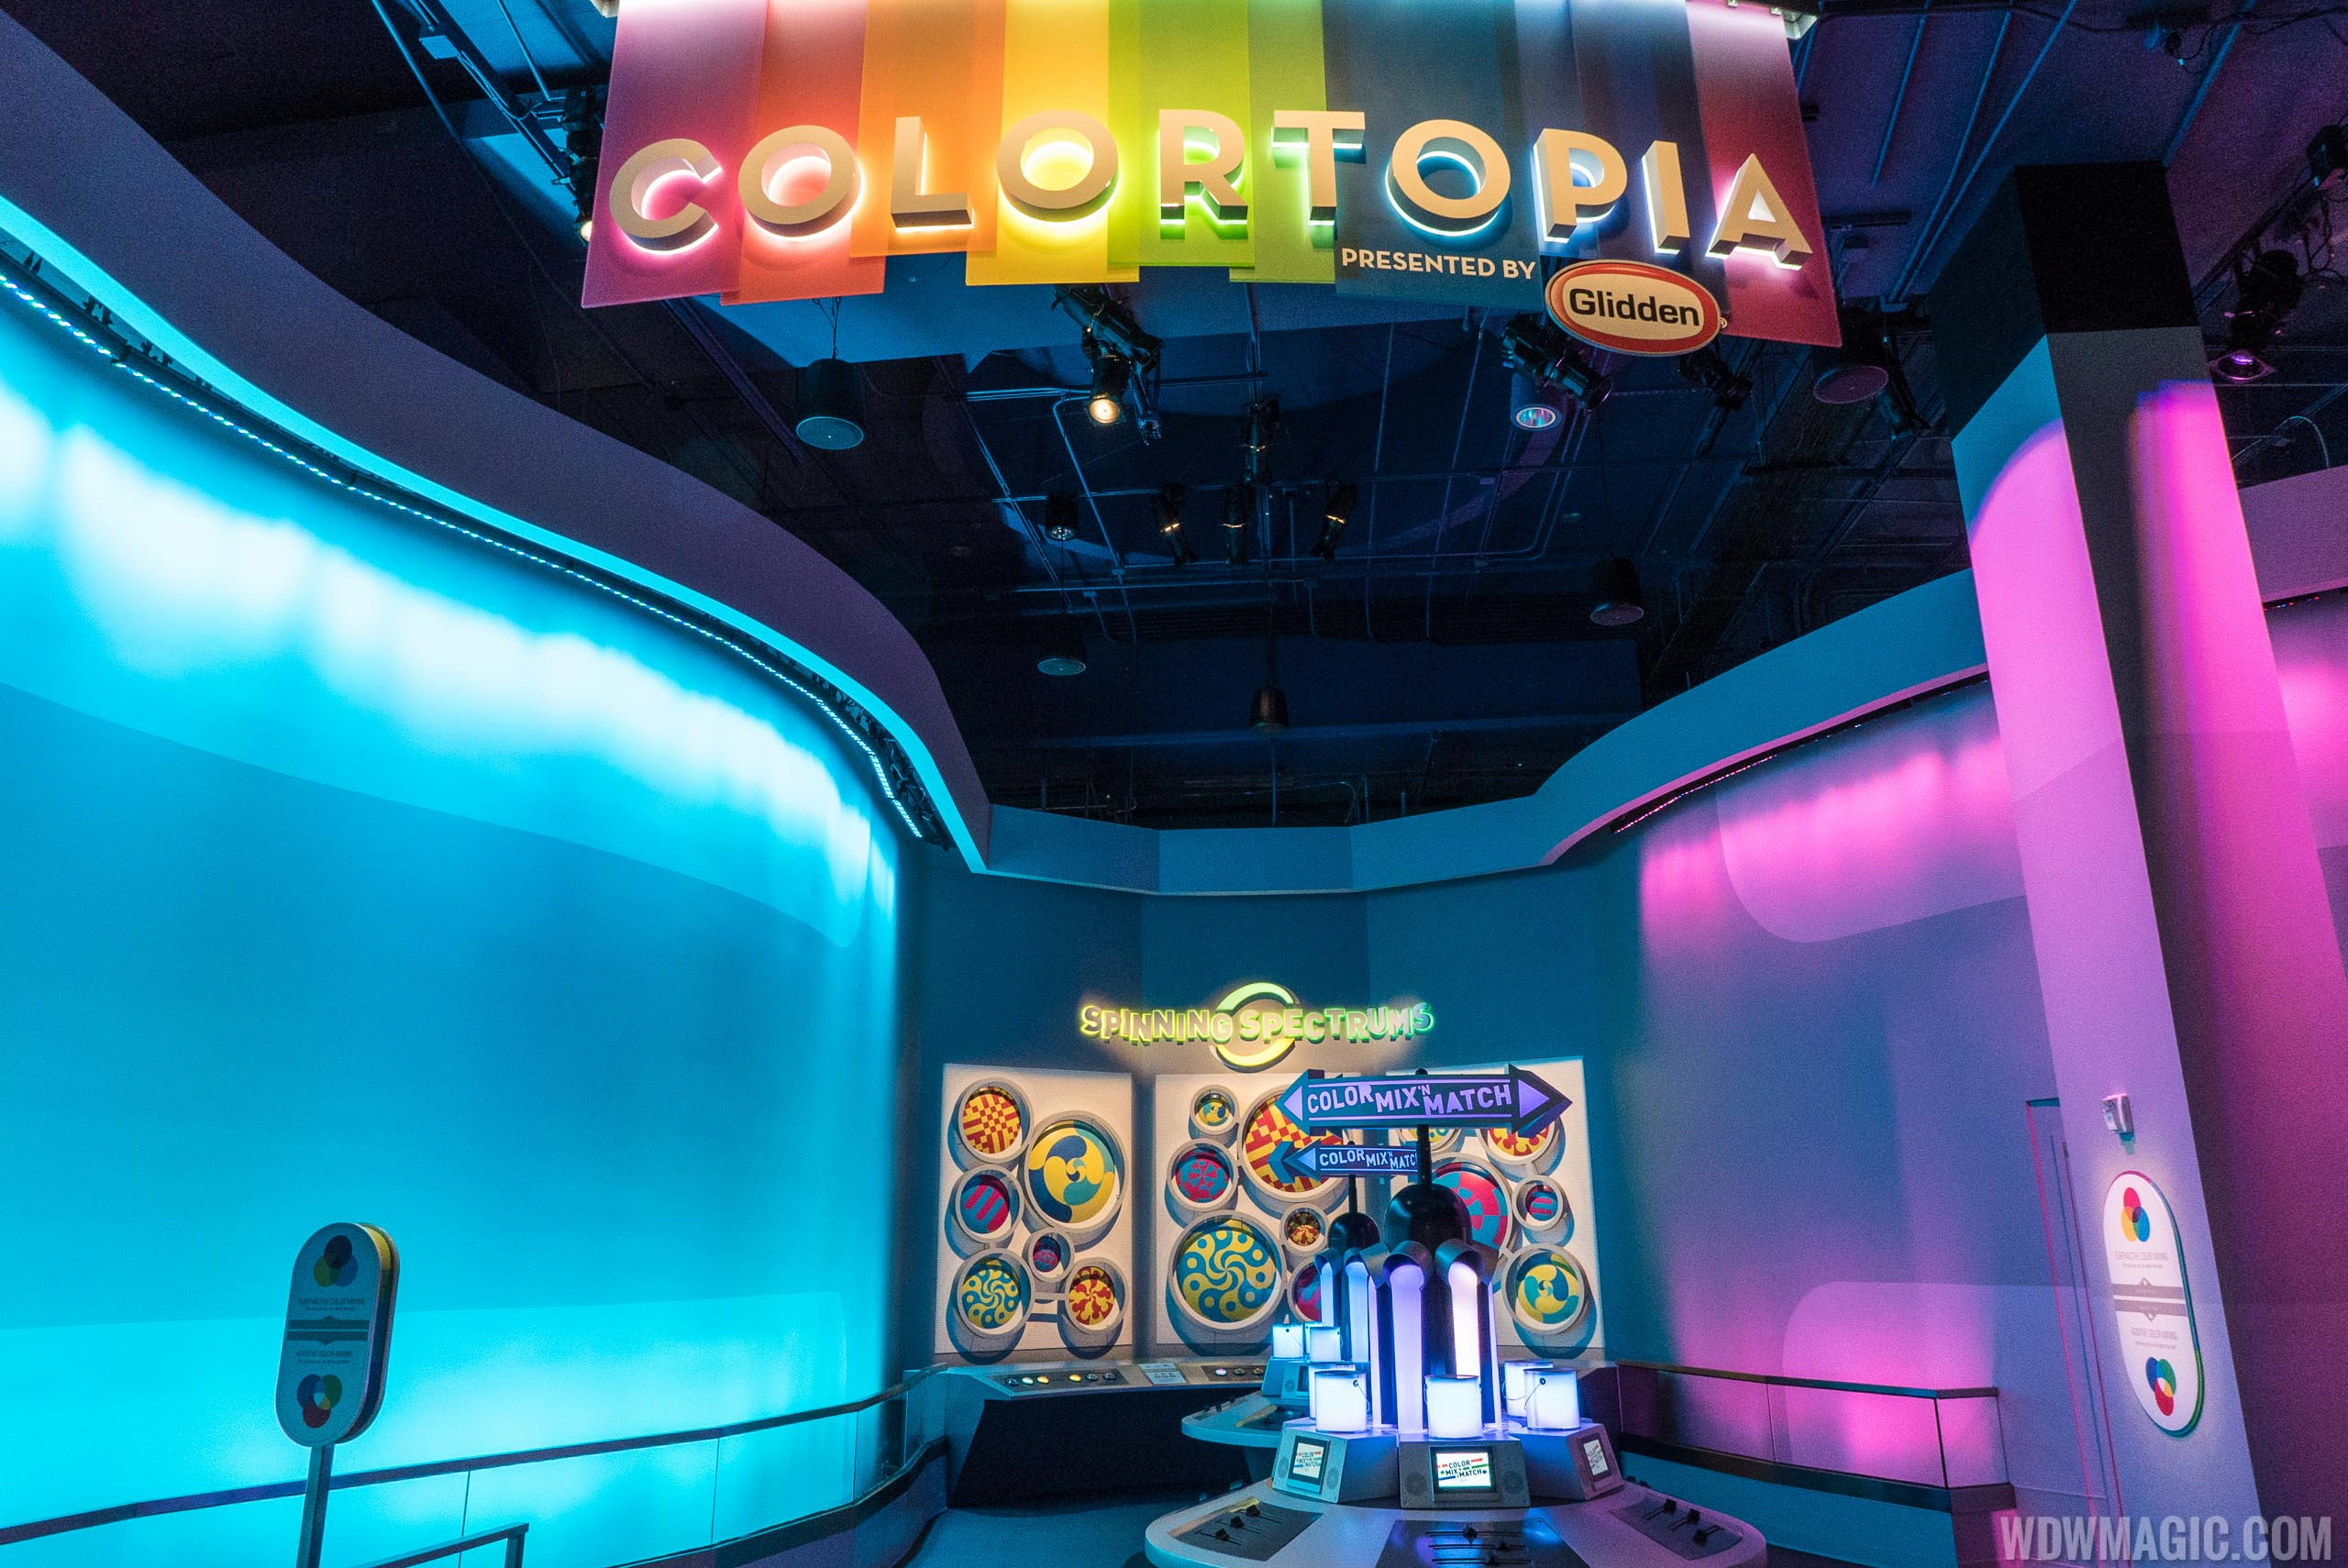 Colortopia exhibit